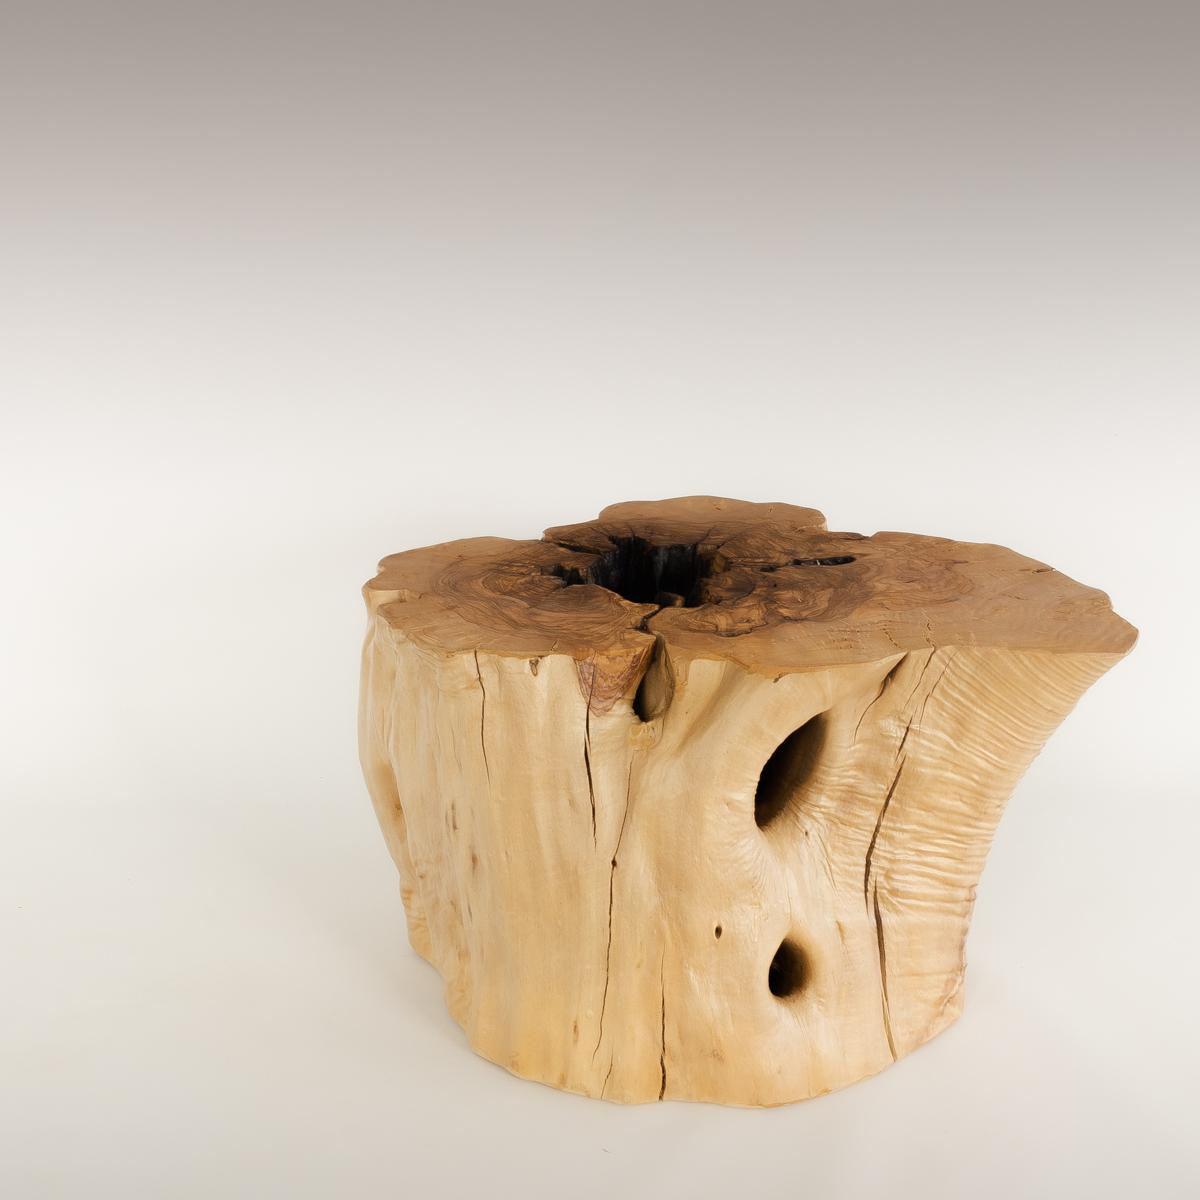 Mesa de Olivo de tronco natural de 36x46x66 | MiRococo.com